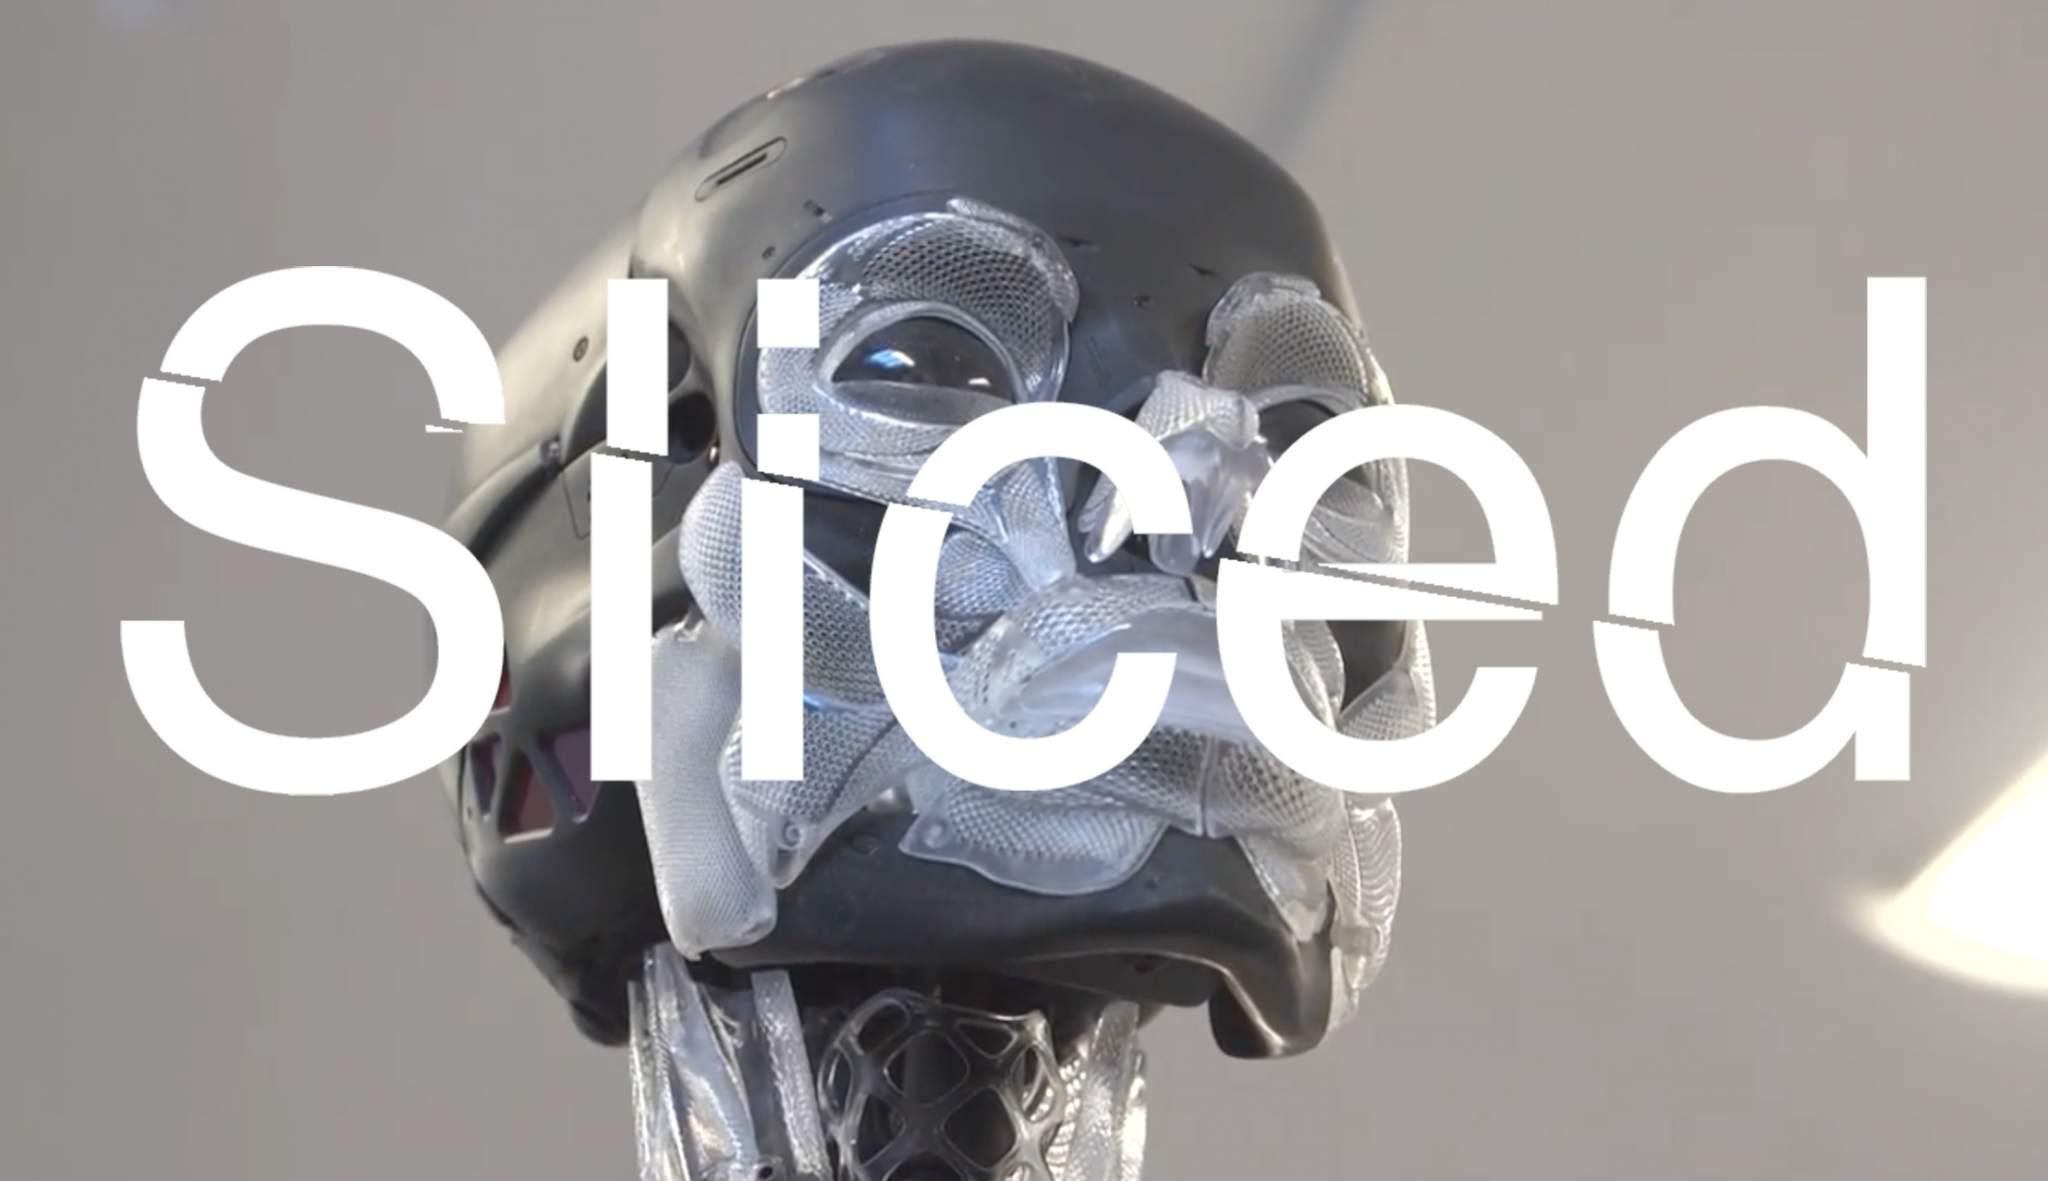 Sliced logo over Weta Workshop's 3D printed robot skeleton for Ghost in the Shell 2017. Original screenshot via Tested on YouTube